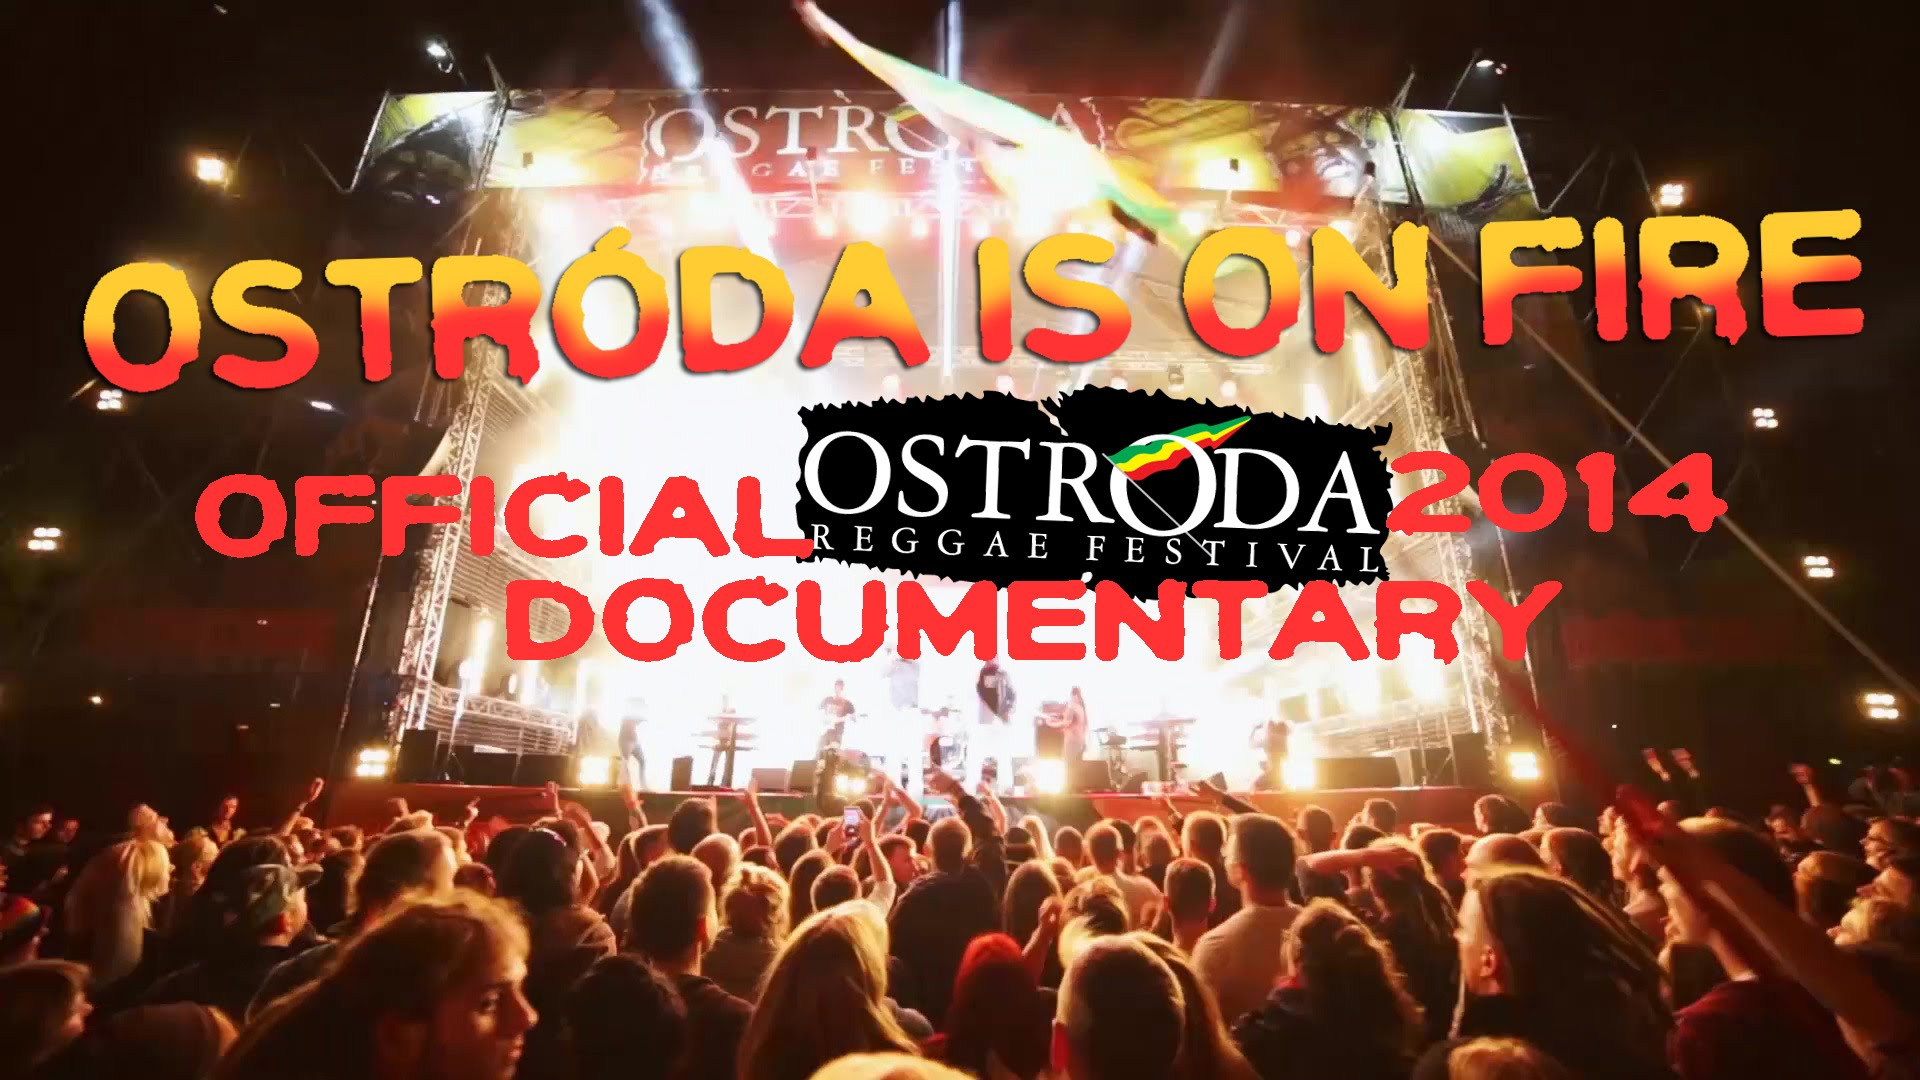 Ostróda is on Fire [4/26/2015]